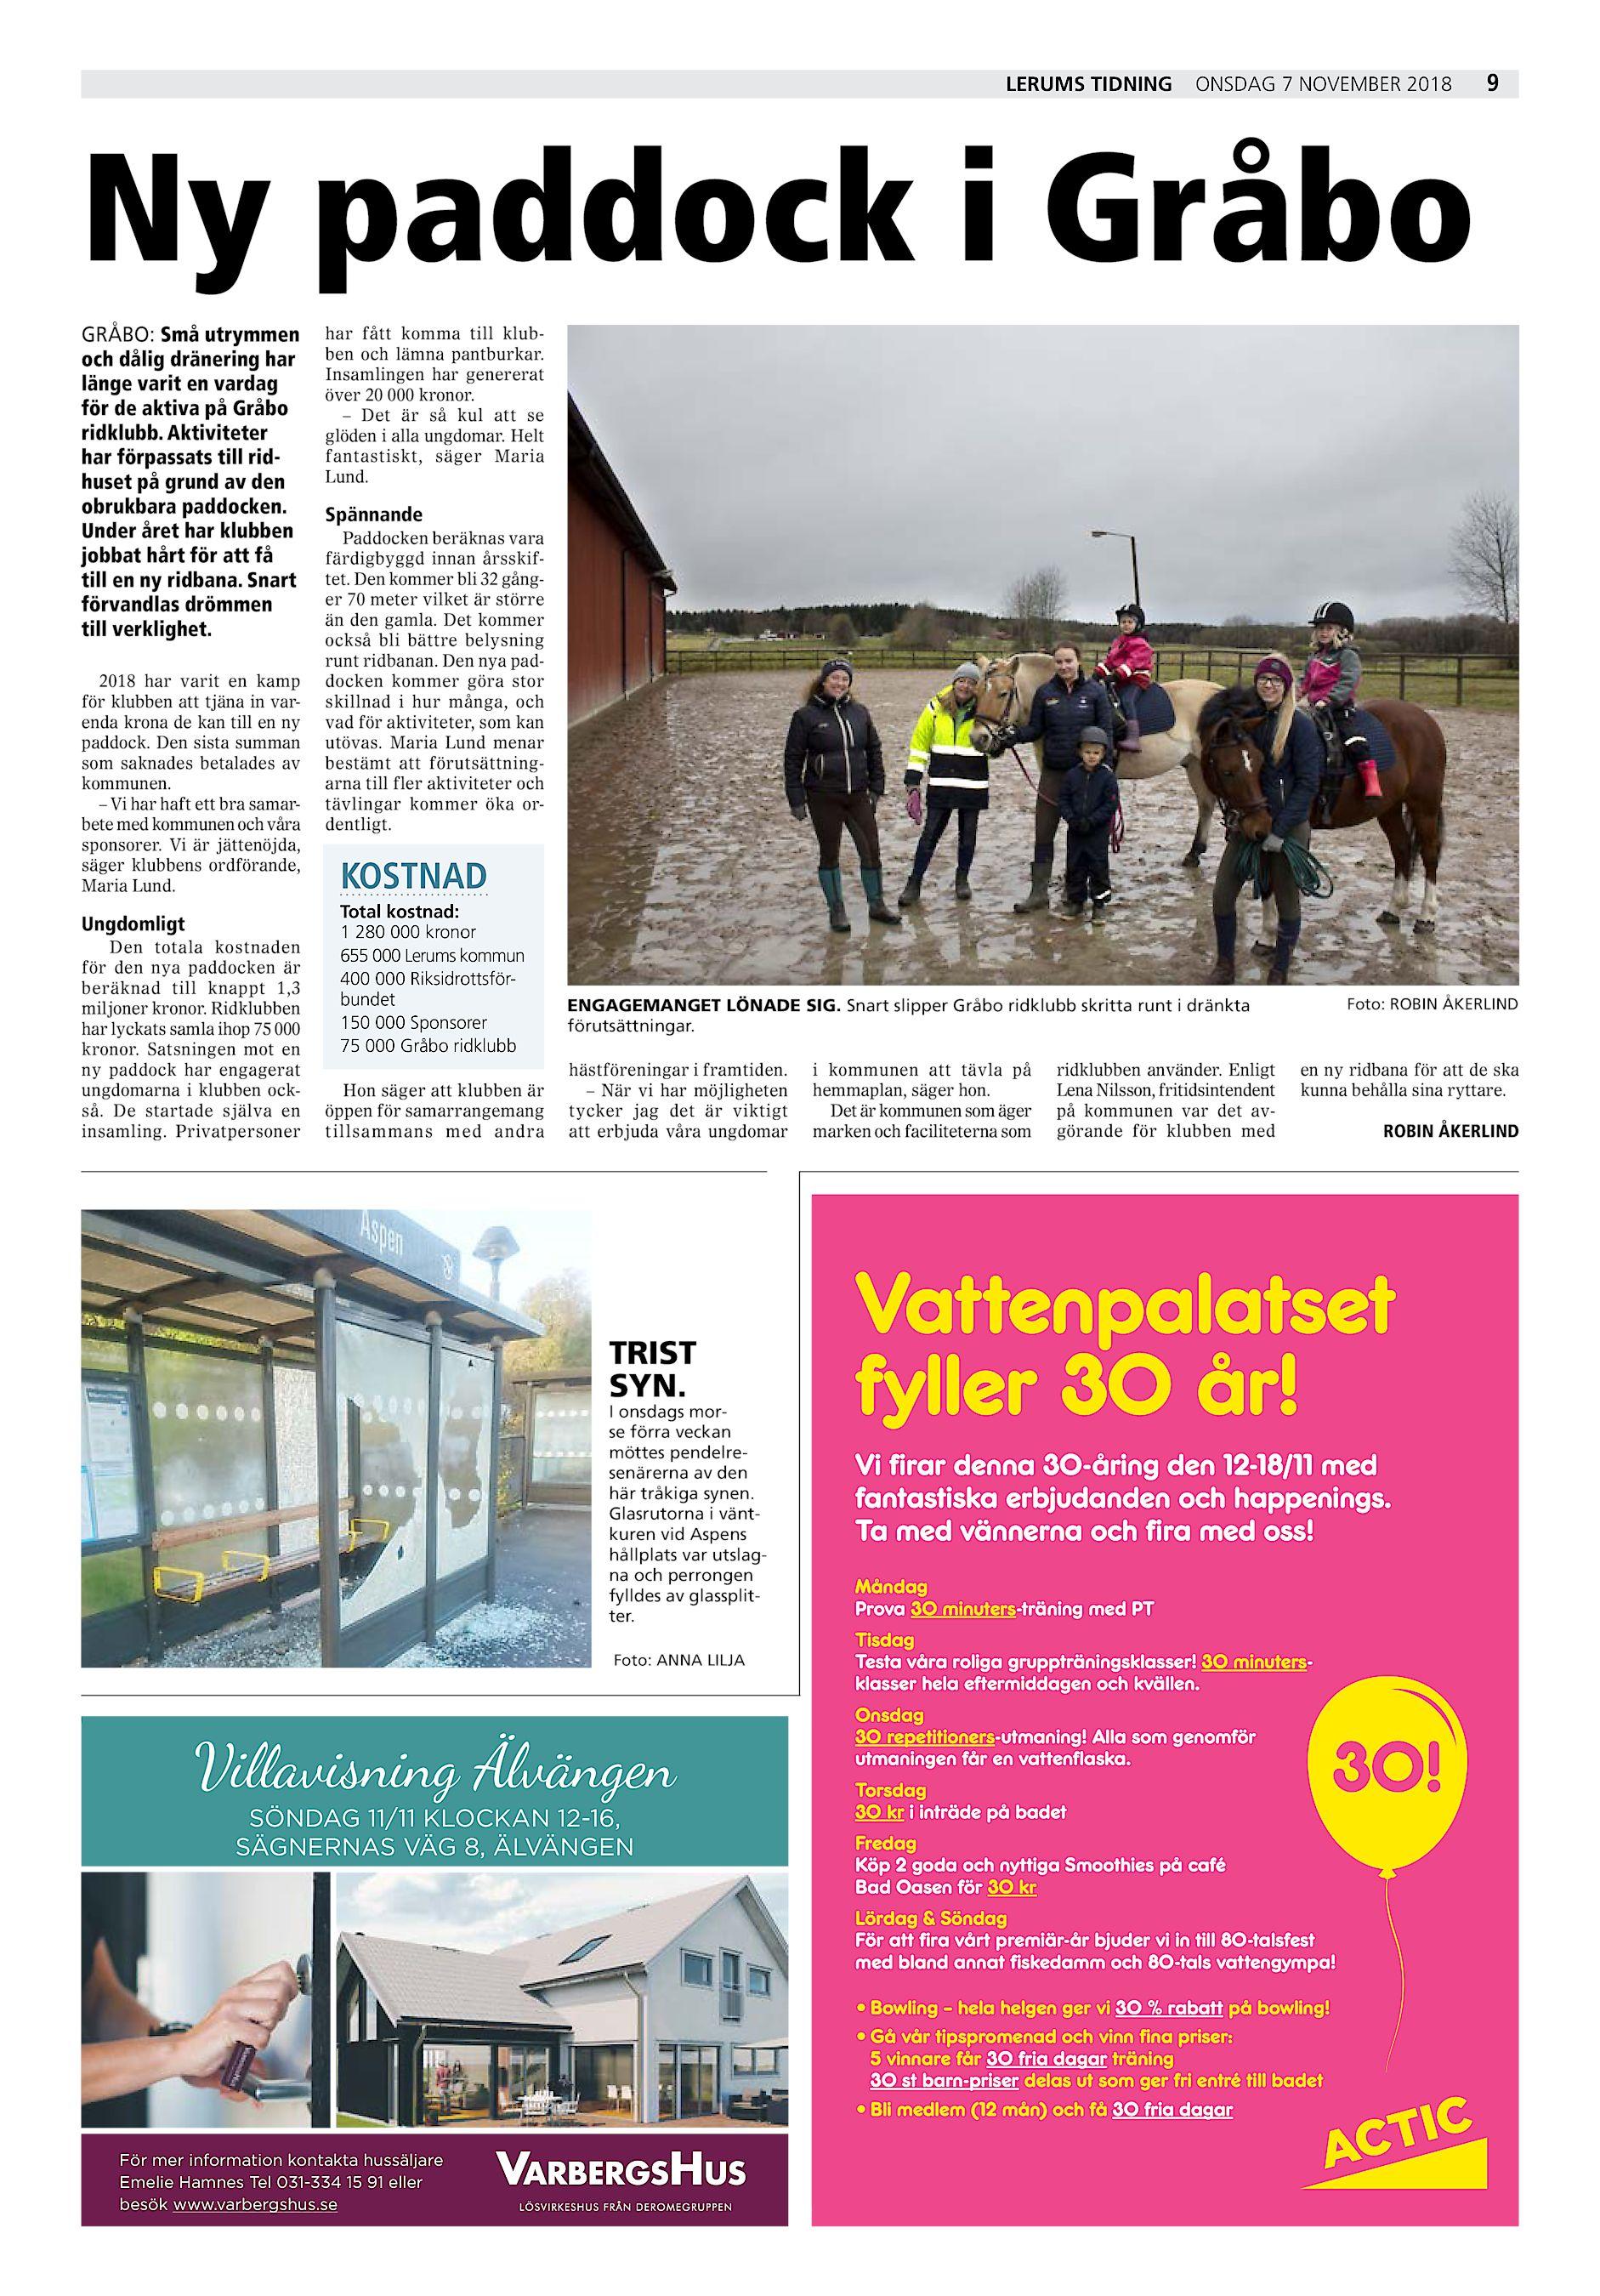 Stadsodling i Norrkpings sdra utkant, stergtland - Samla